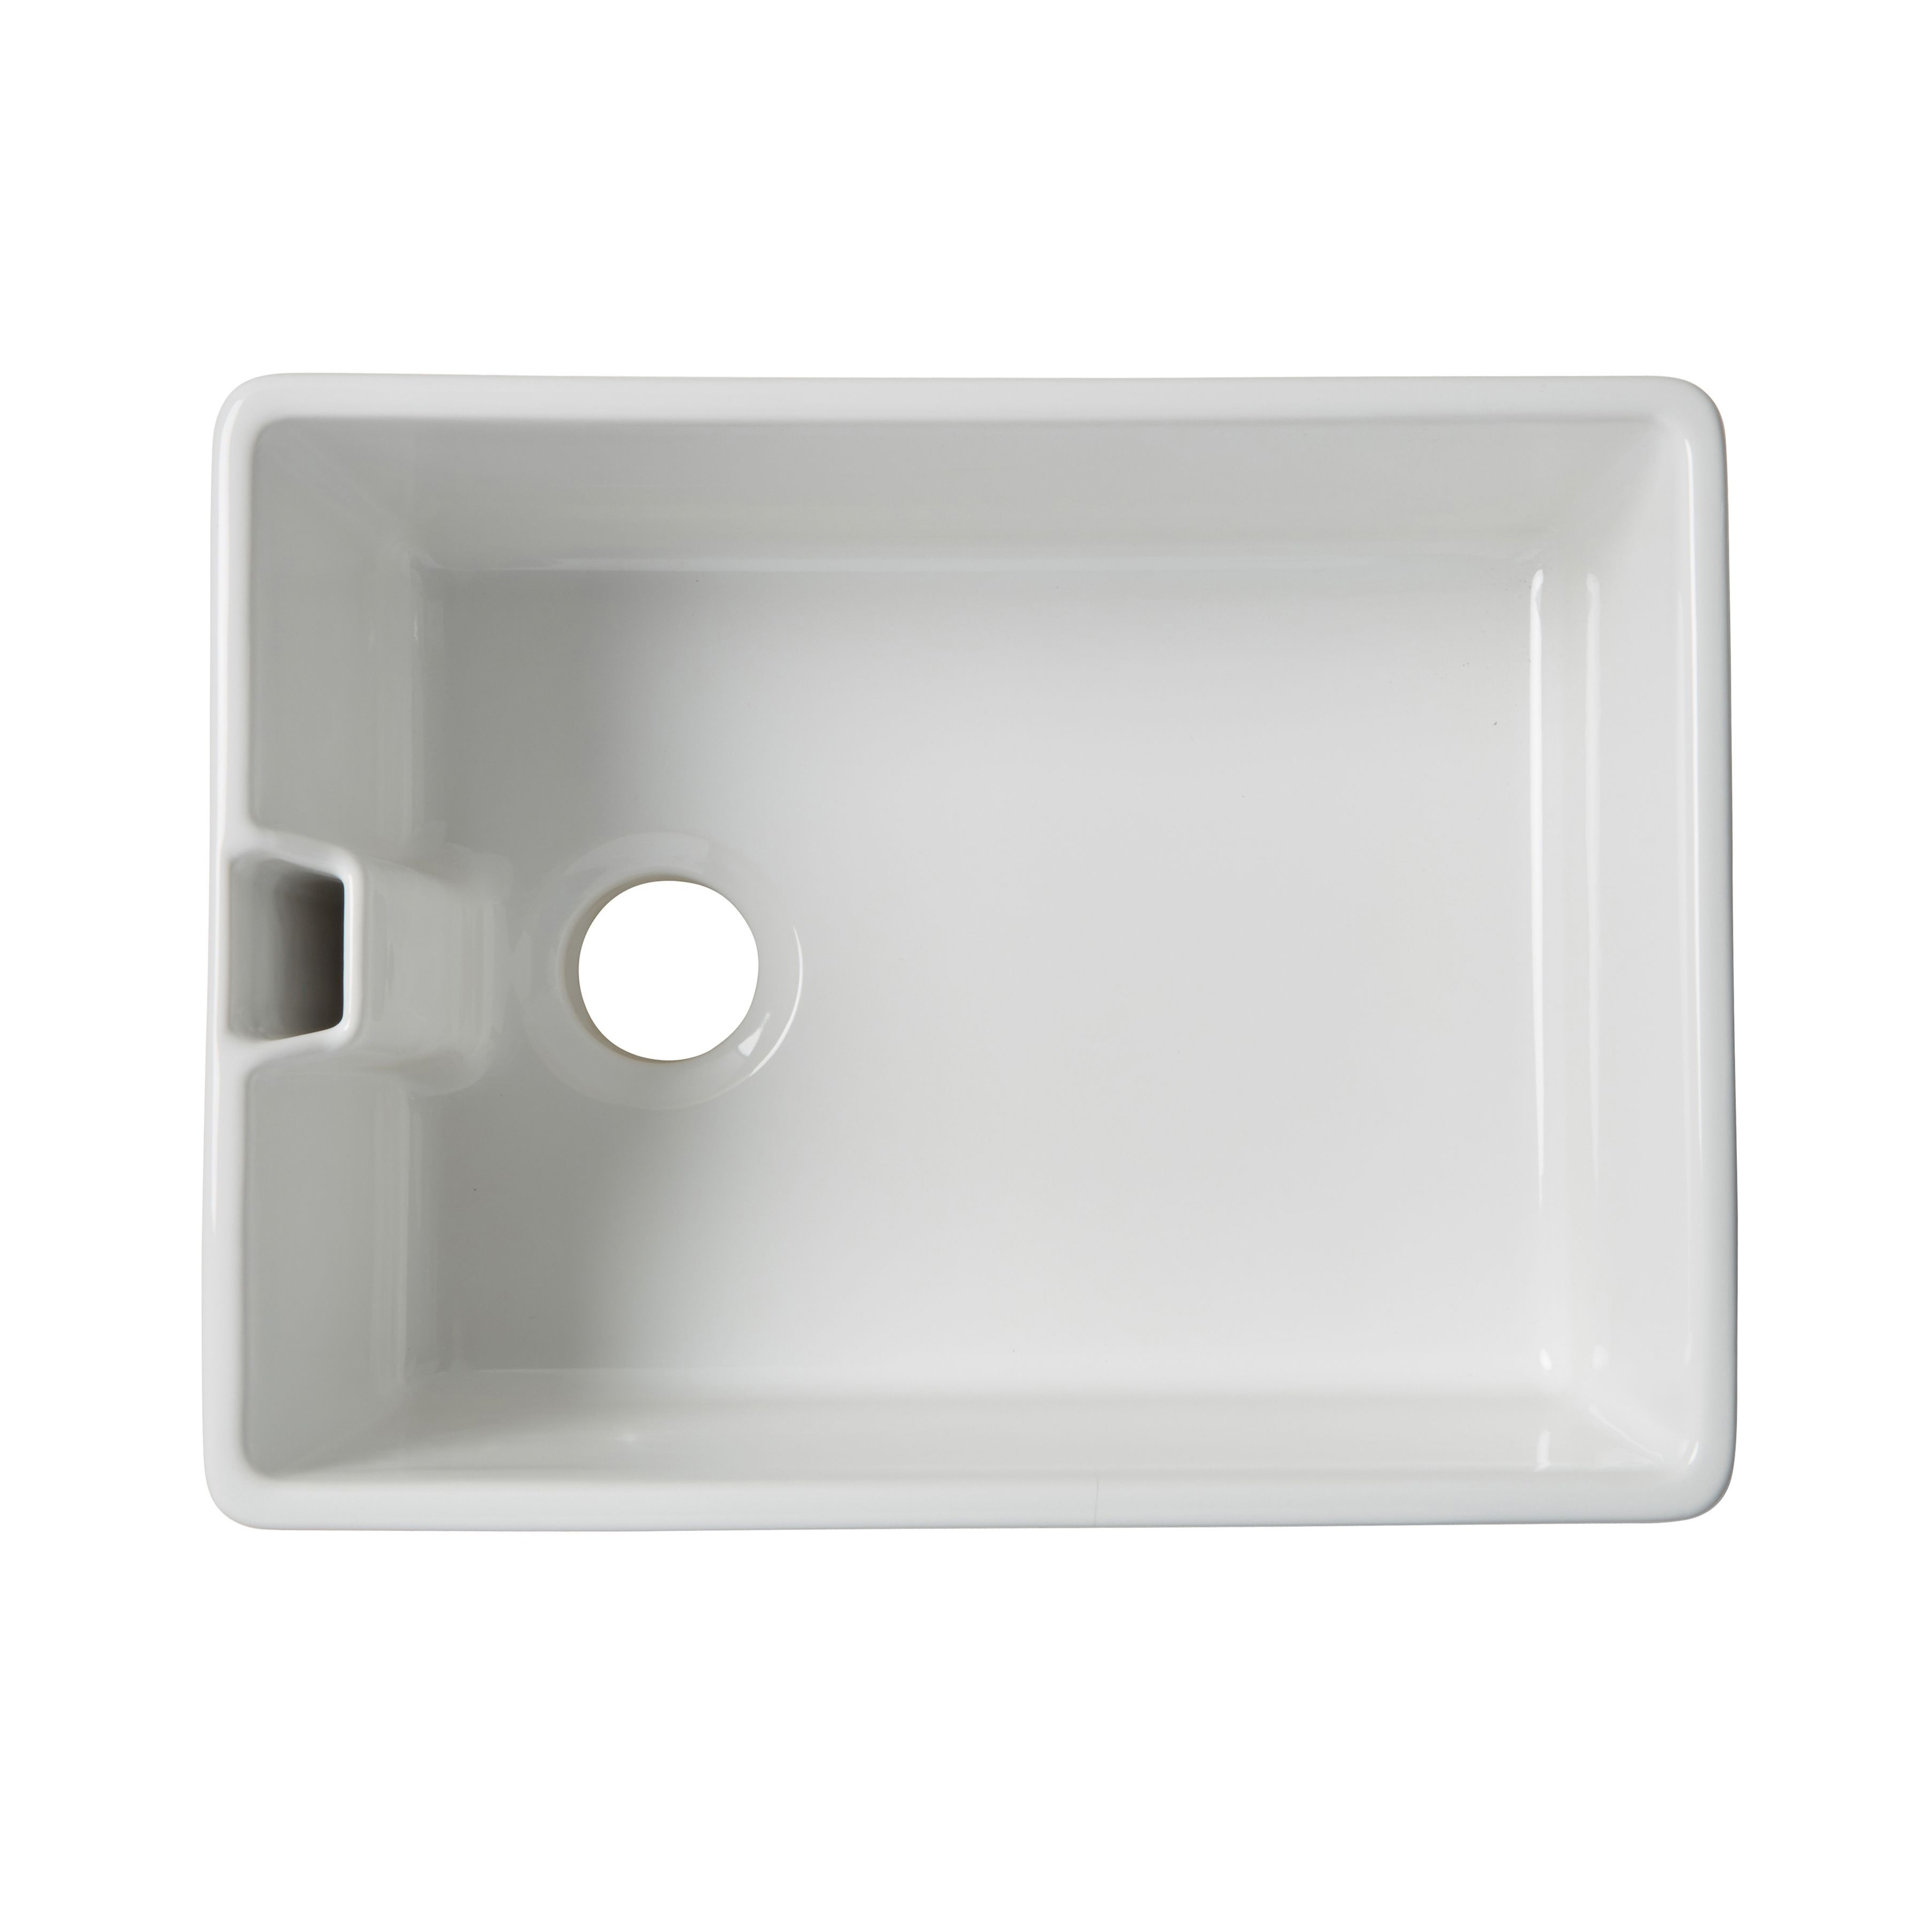 Cooke & Lewis Chadwick 1 Bowl White Ceramic Belfast Sink | Belfast ...